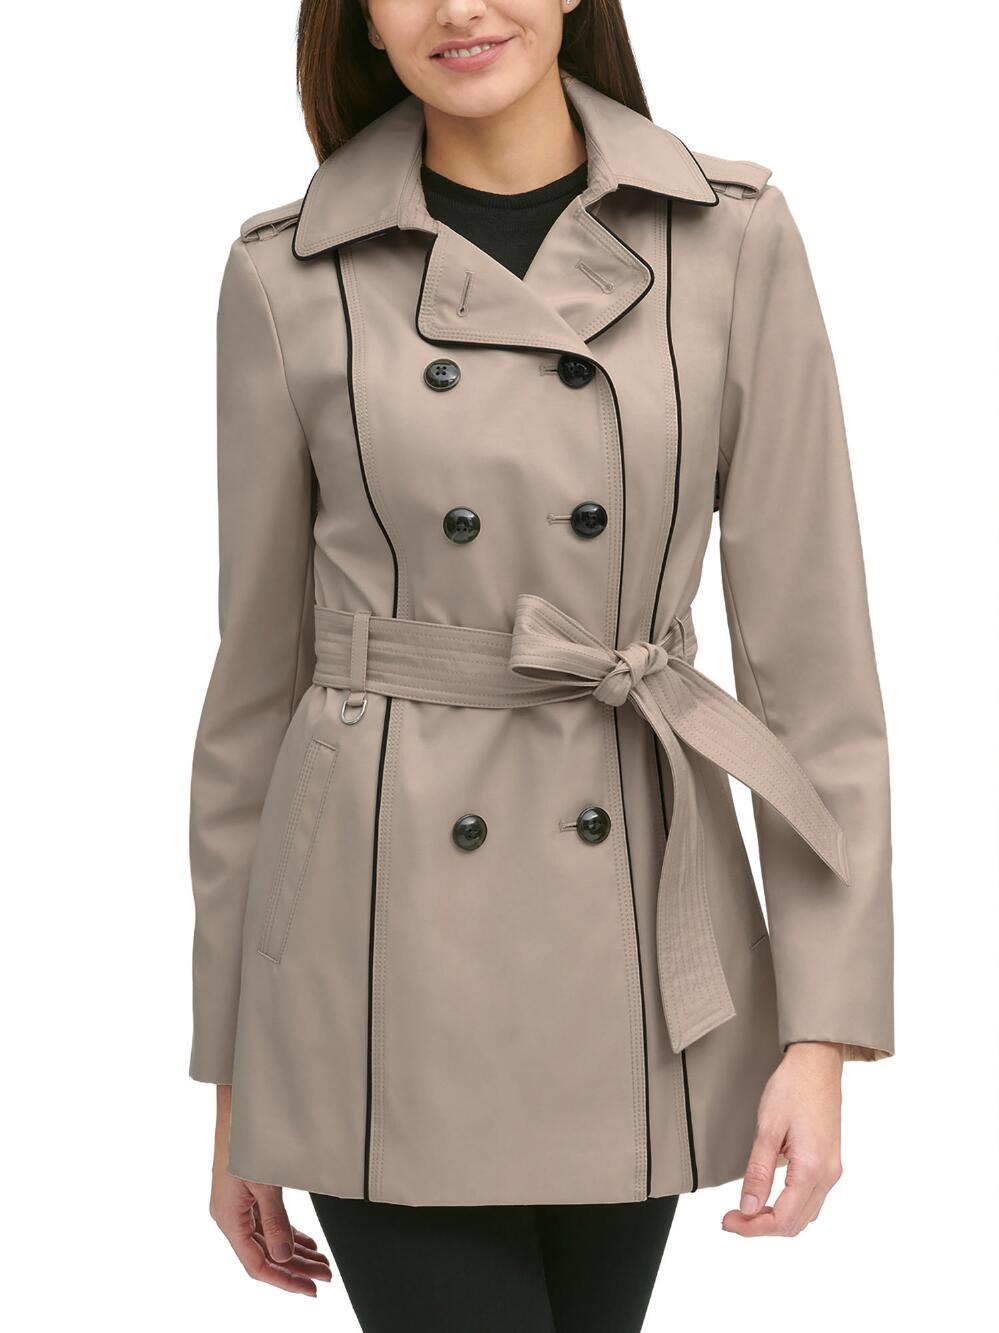 Bonded Trench Coat Wilsons Leather Coat Trench Coat Leather Coat